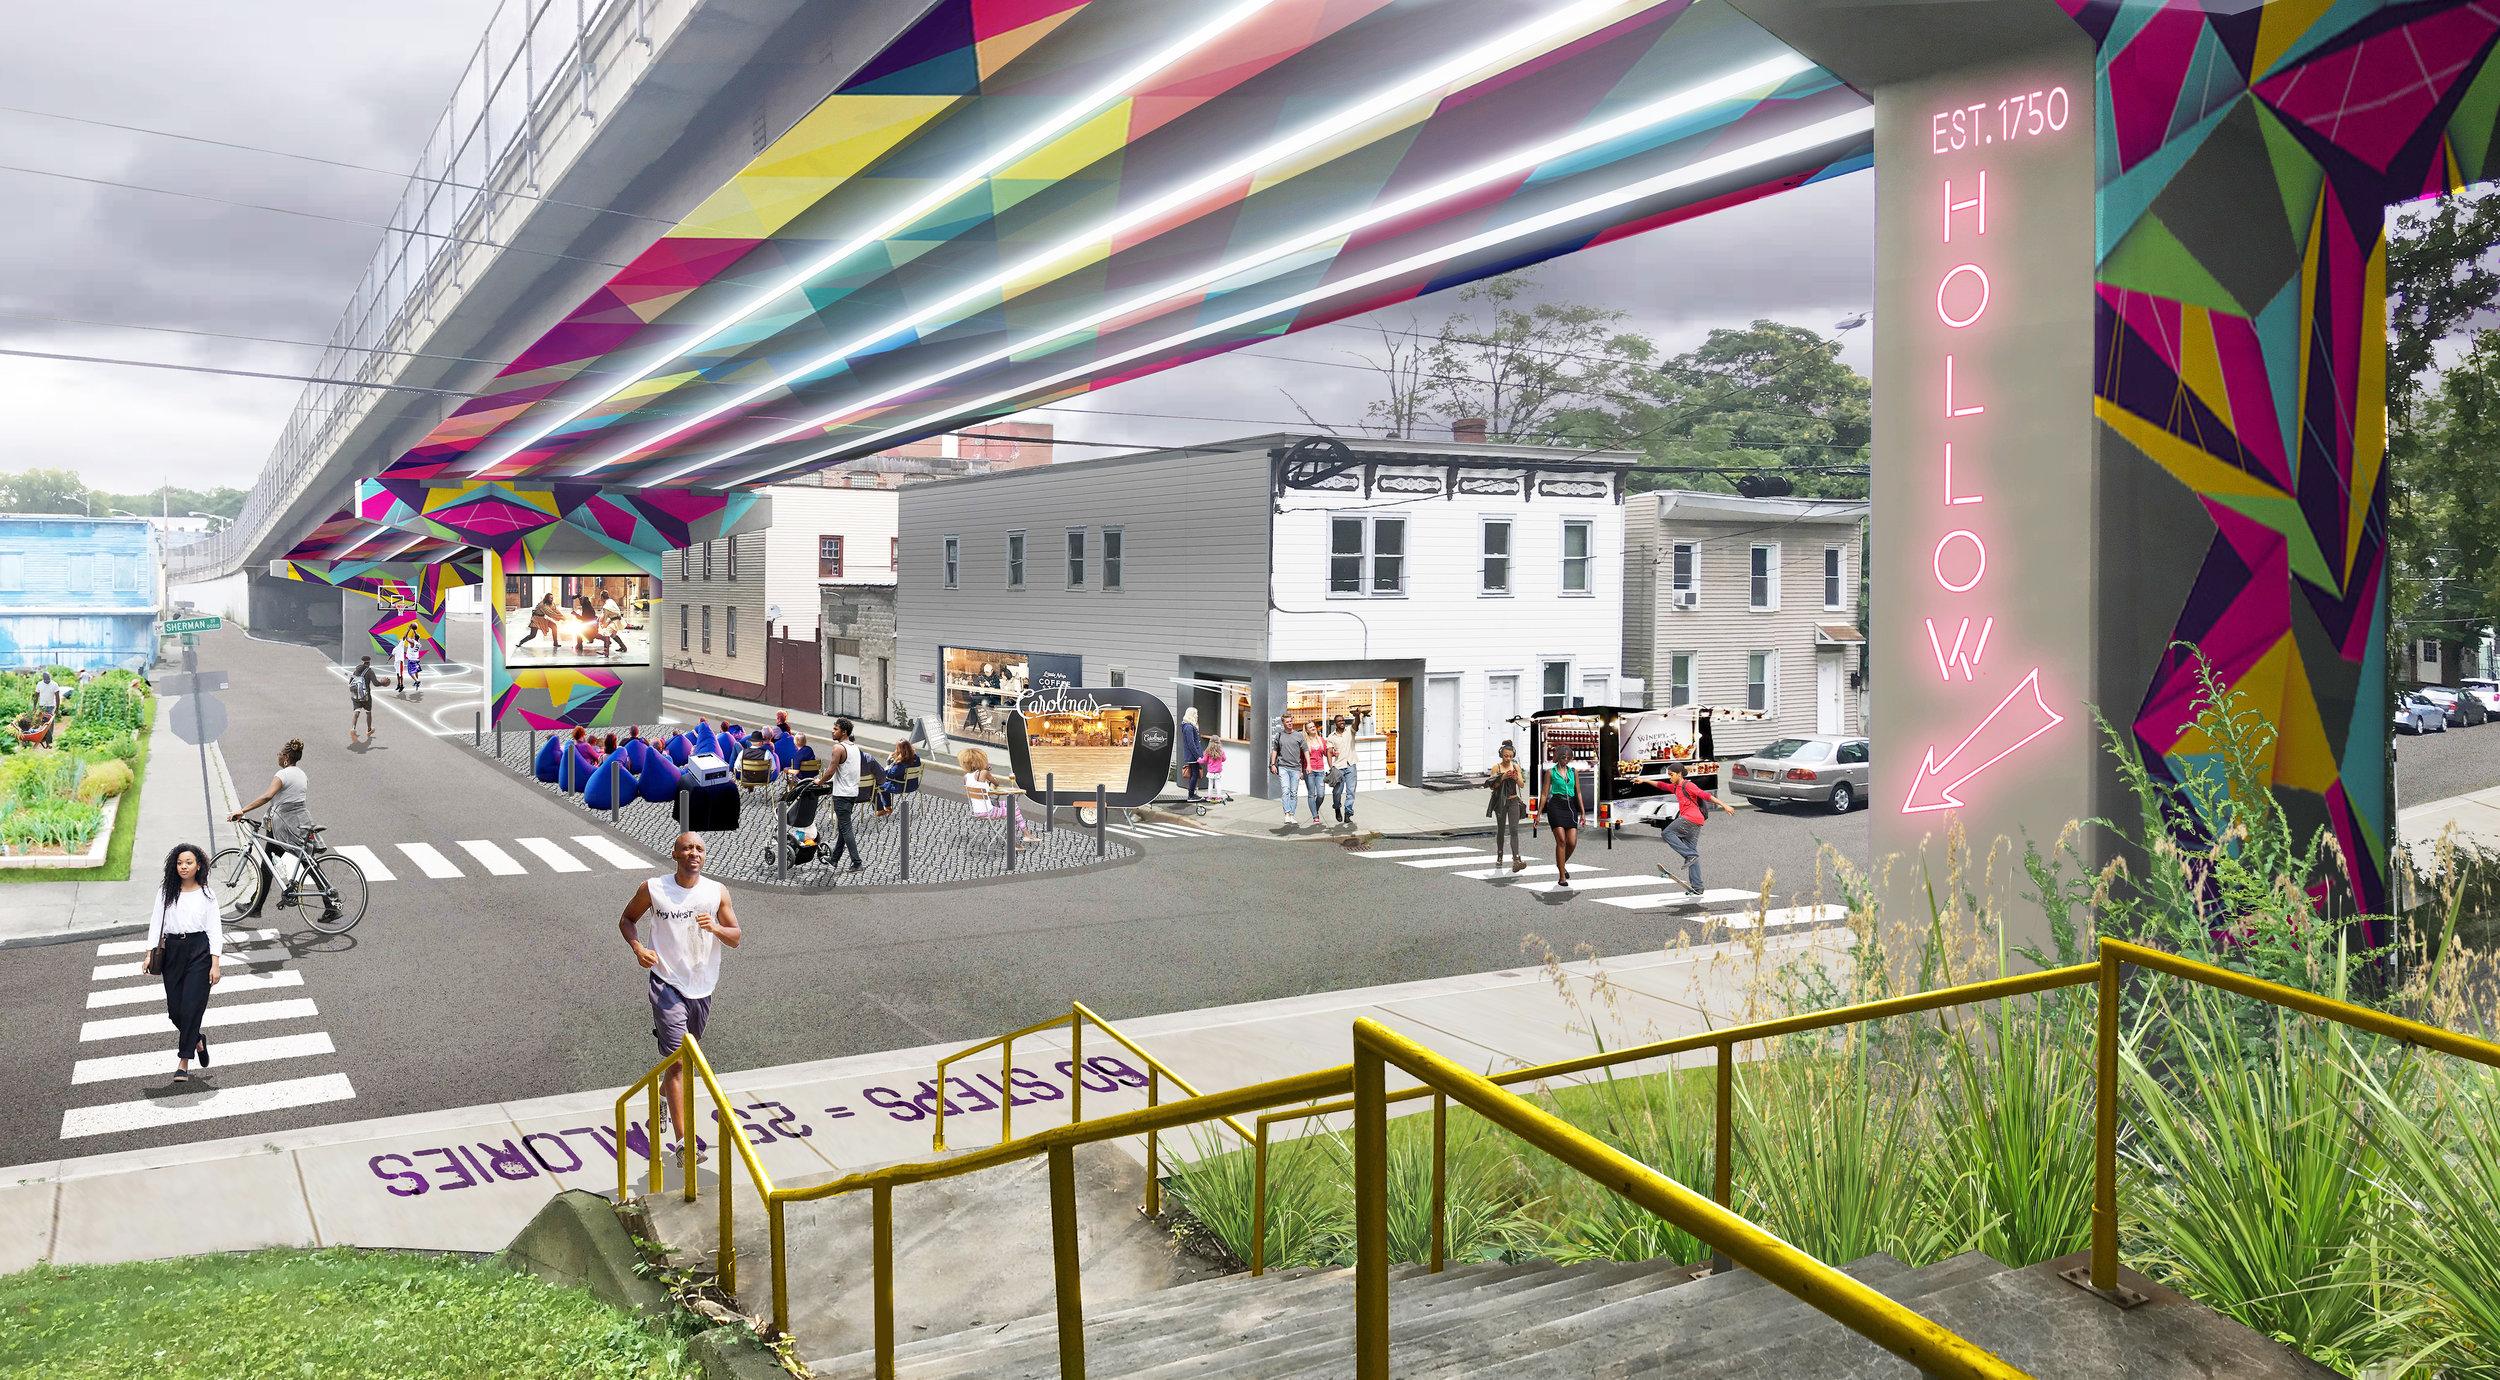 Sheridan Hollow_Underpass Render Proposed 2_rev.jpg